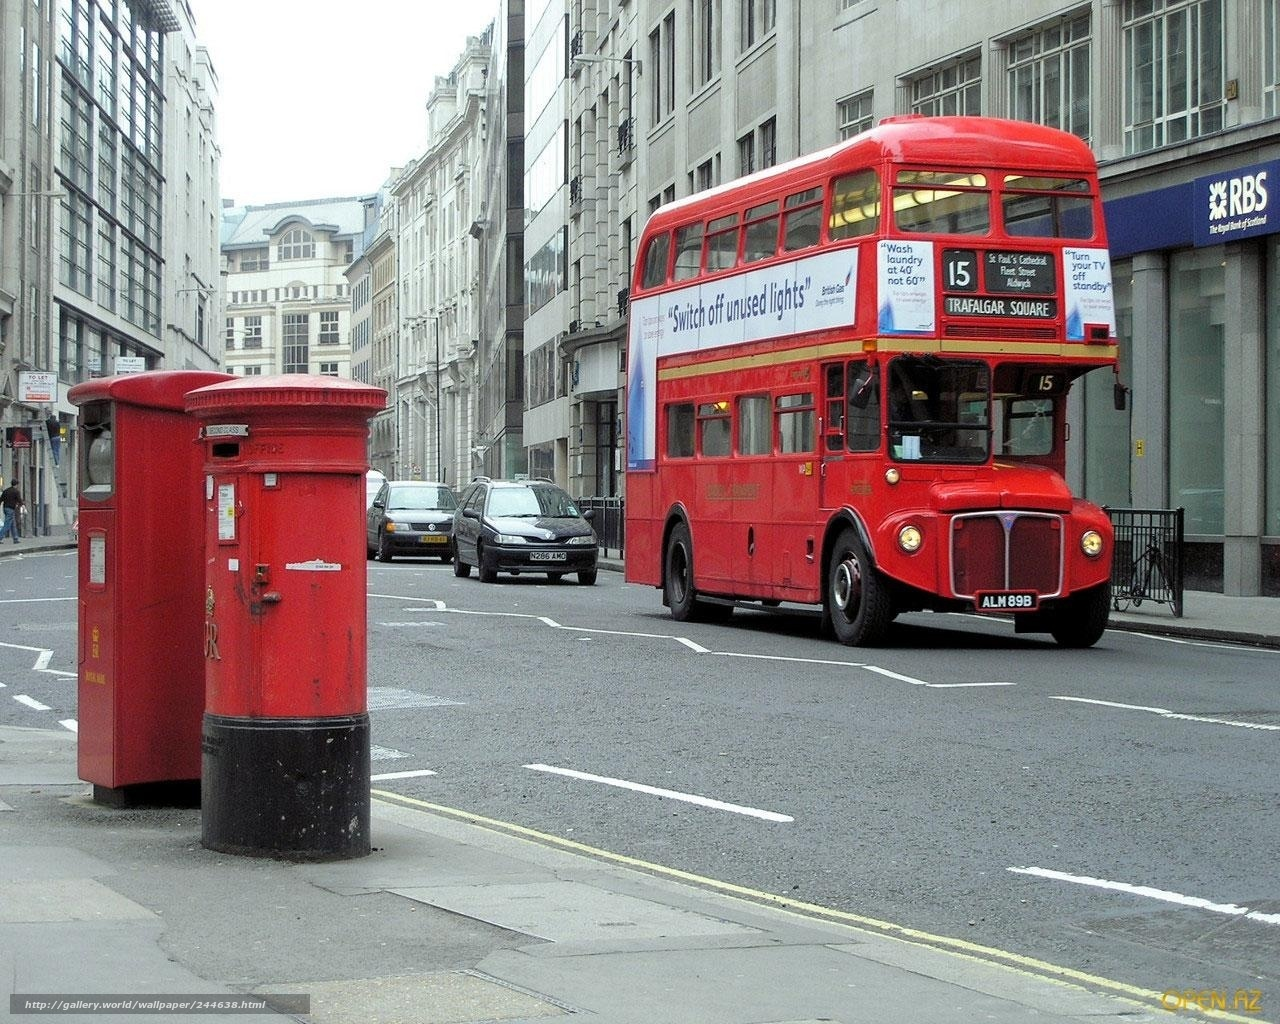 Download Wallpaper London, England, Bus, Trash Can Free Desktop Wallpaper In The Resolution